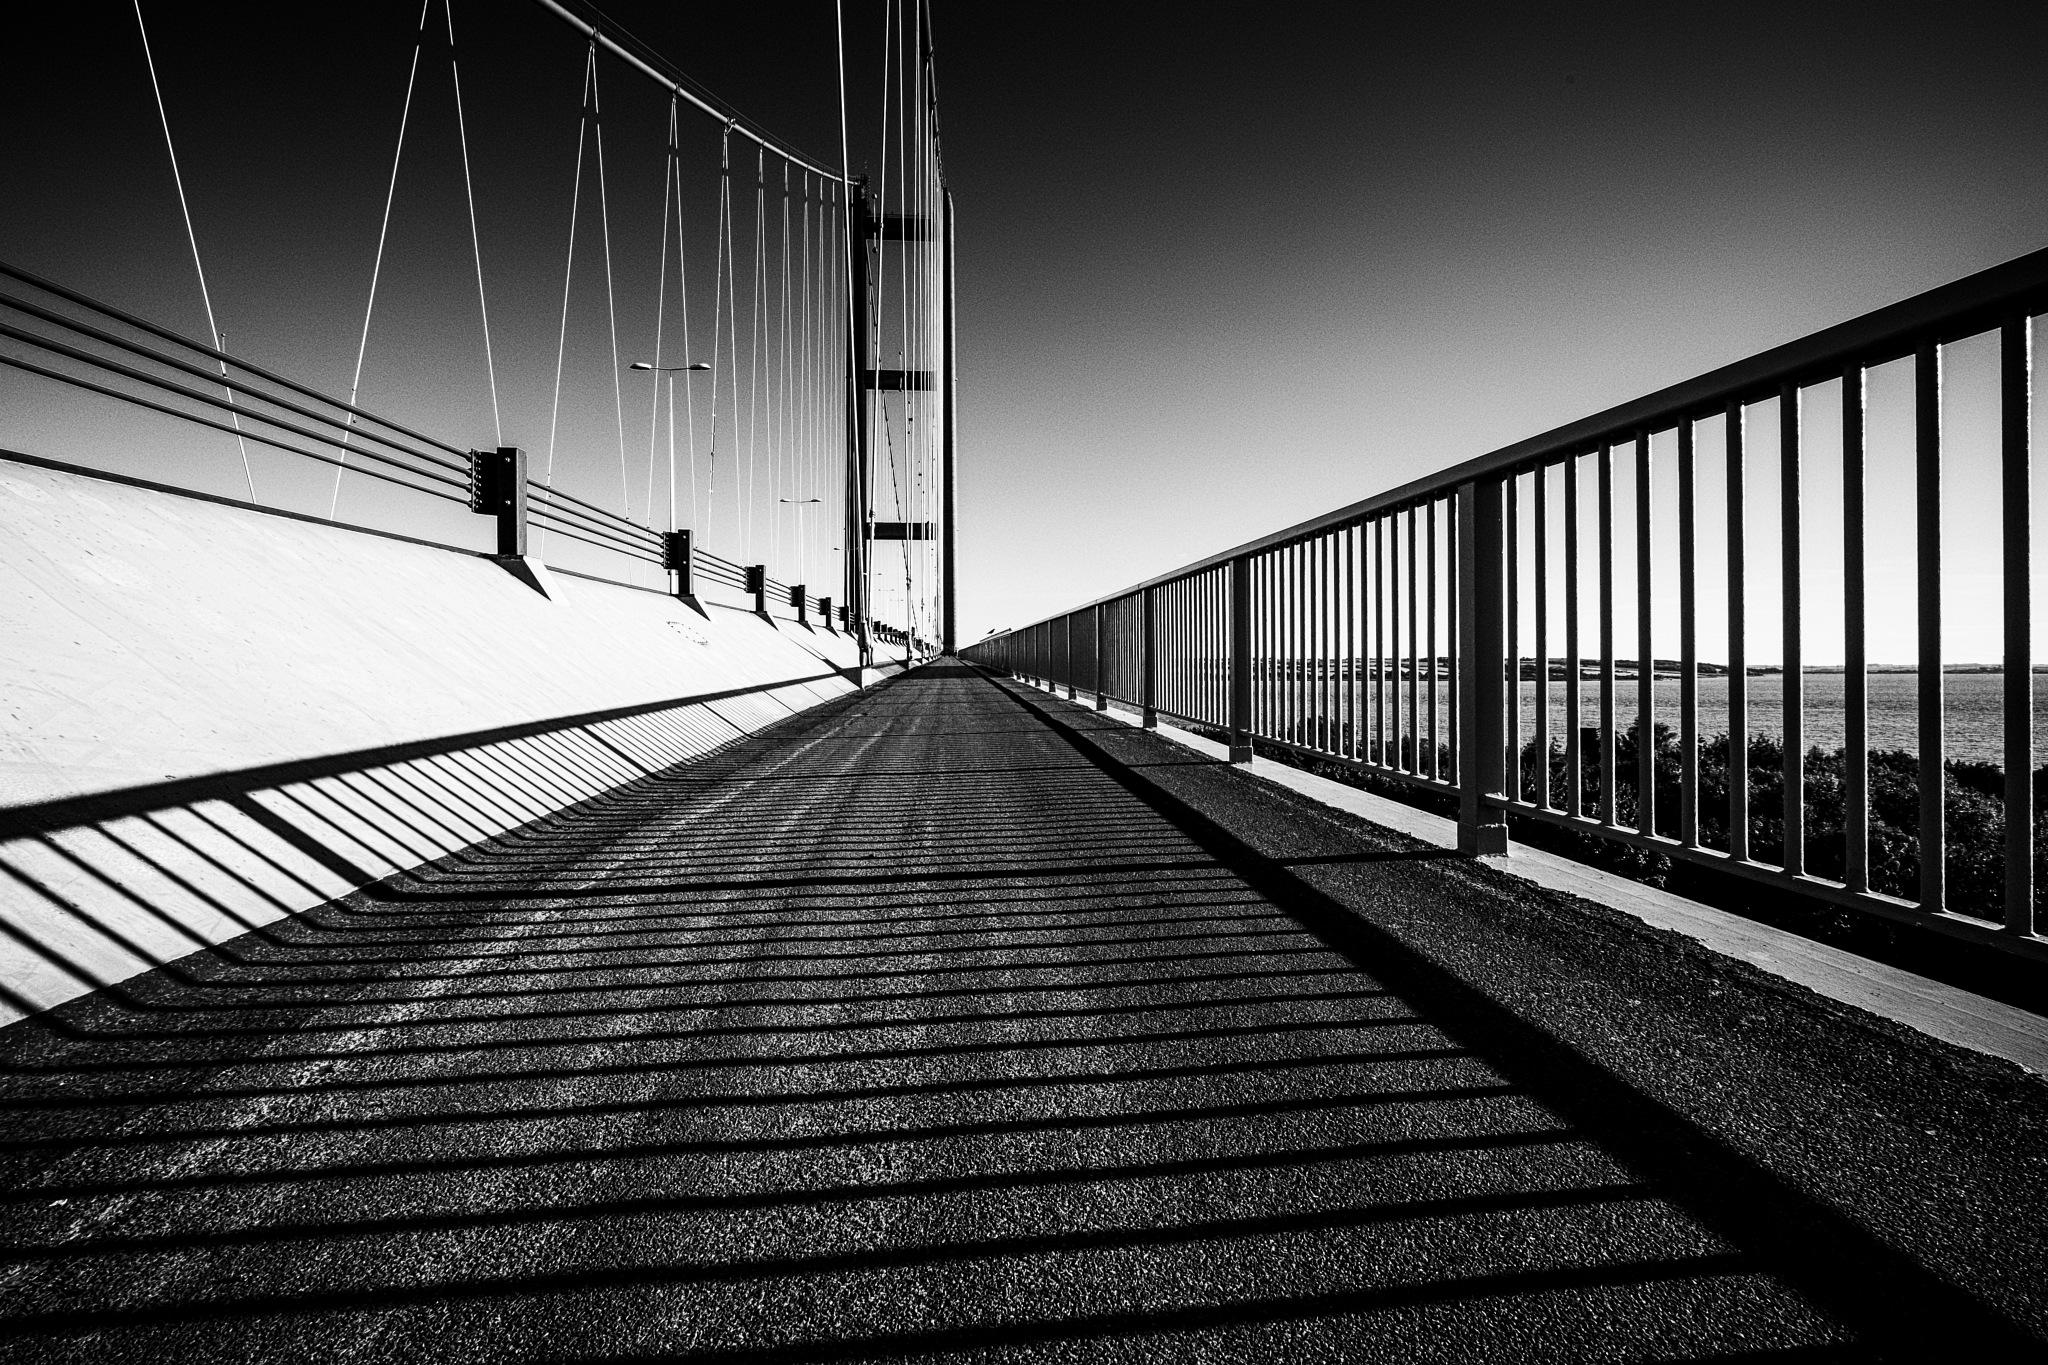 The Humber Bridge  by Chris Bird